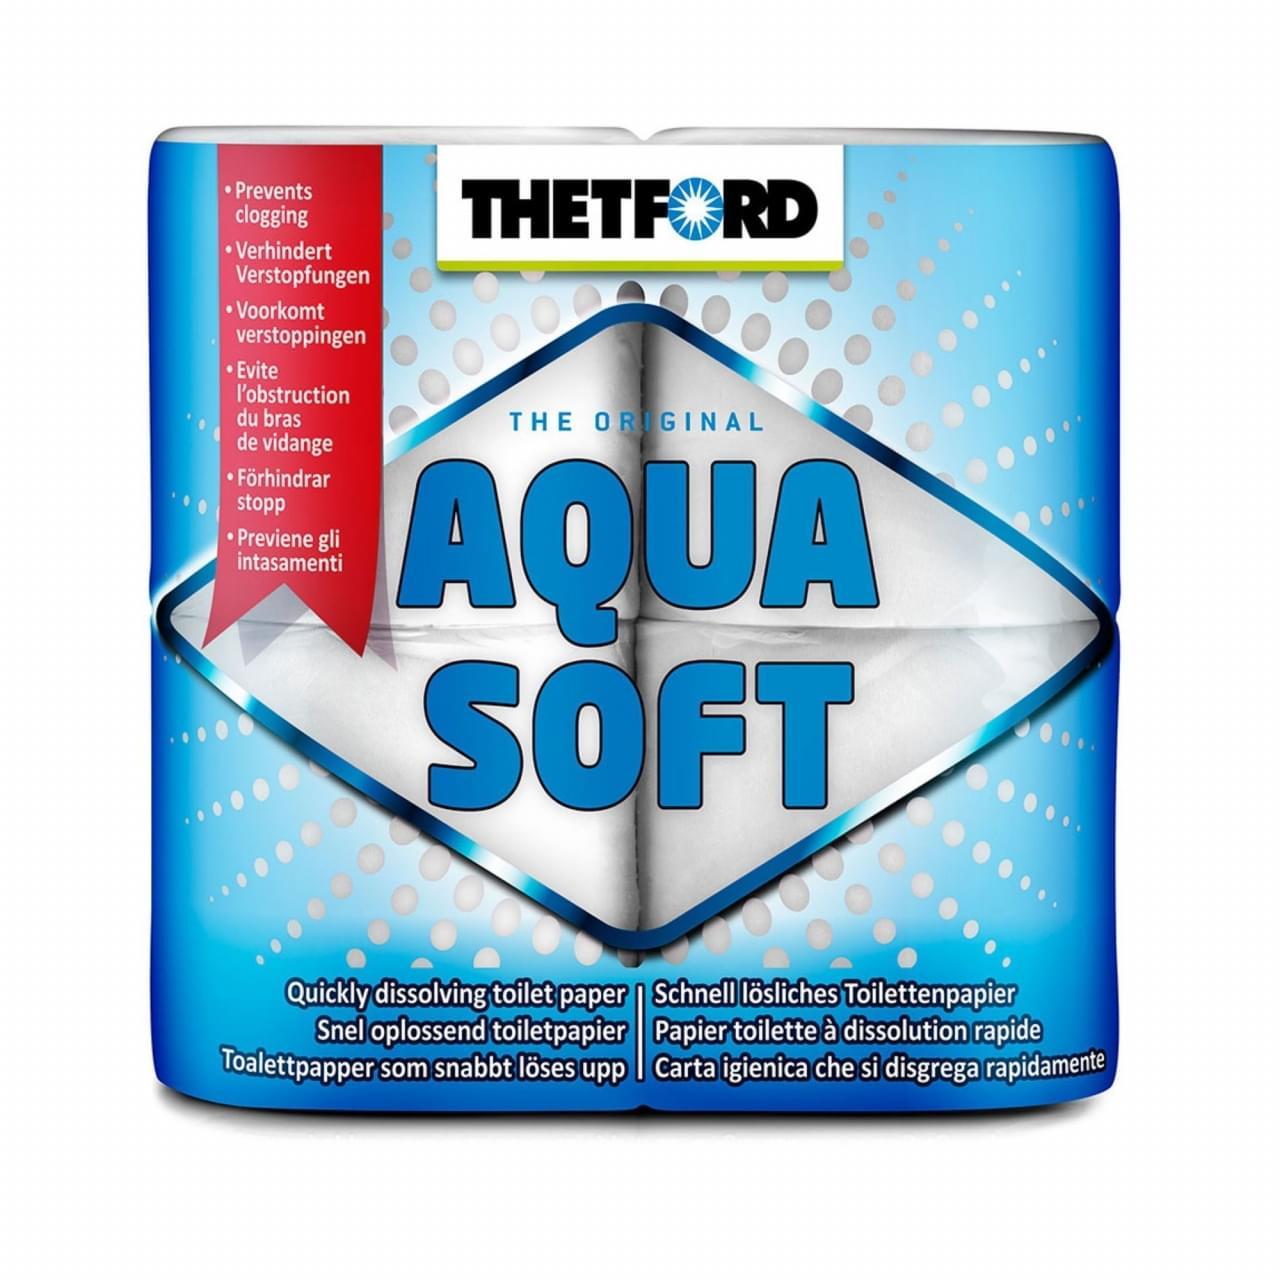 Thetford Aquasoft Toiletpapier